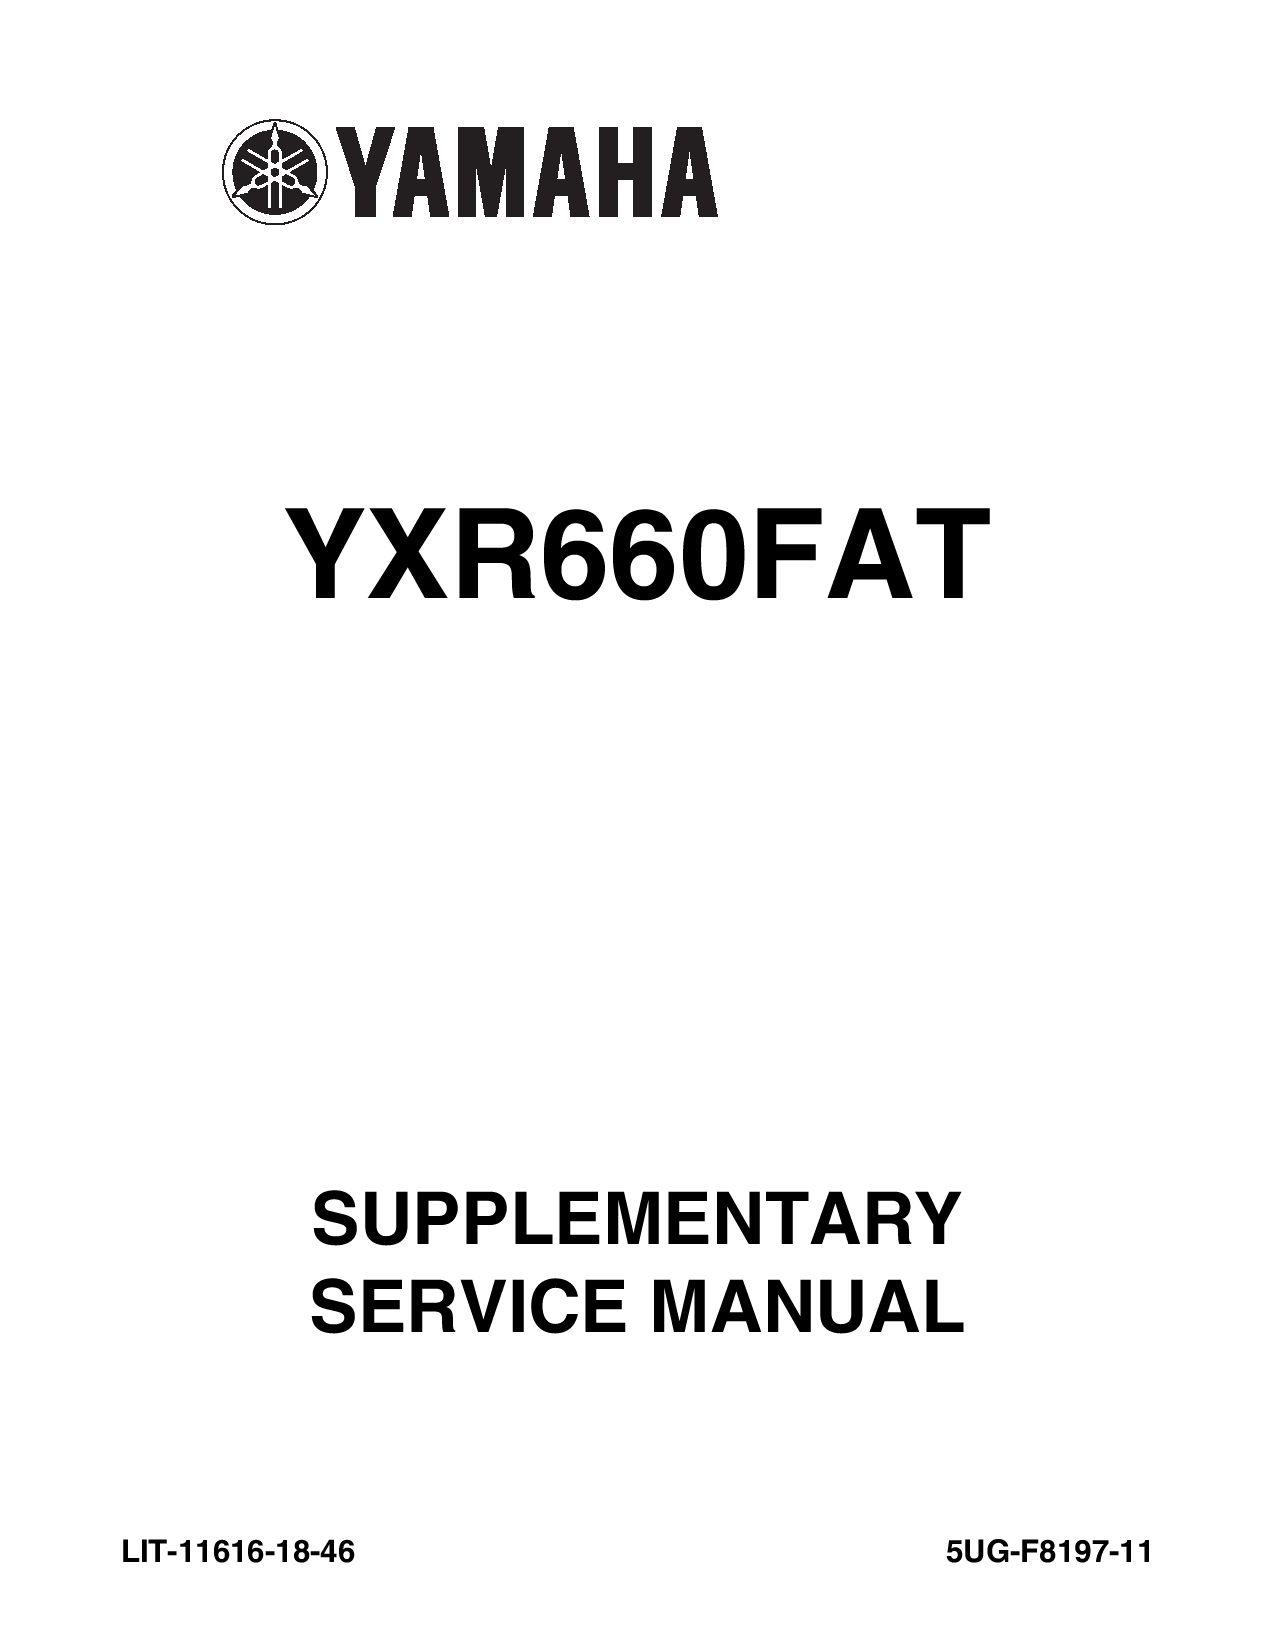 2004 Yamaha Atv Yxr660fas Lit 11616 17 23 Service Manual